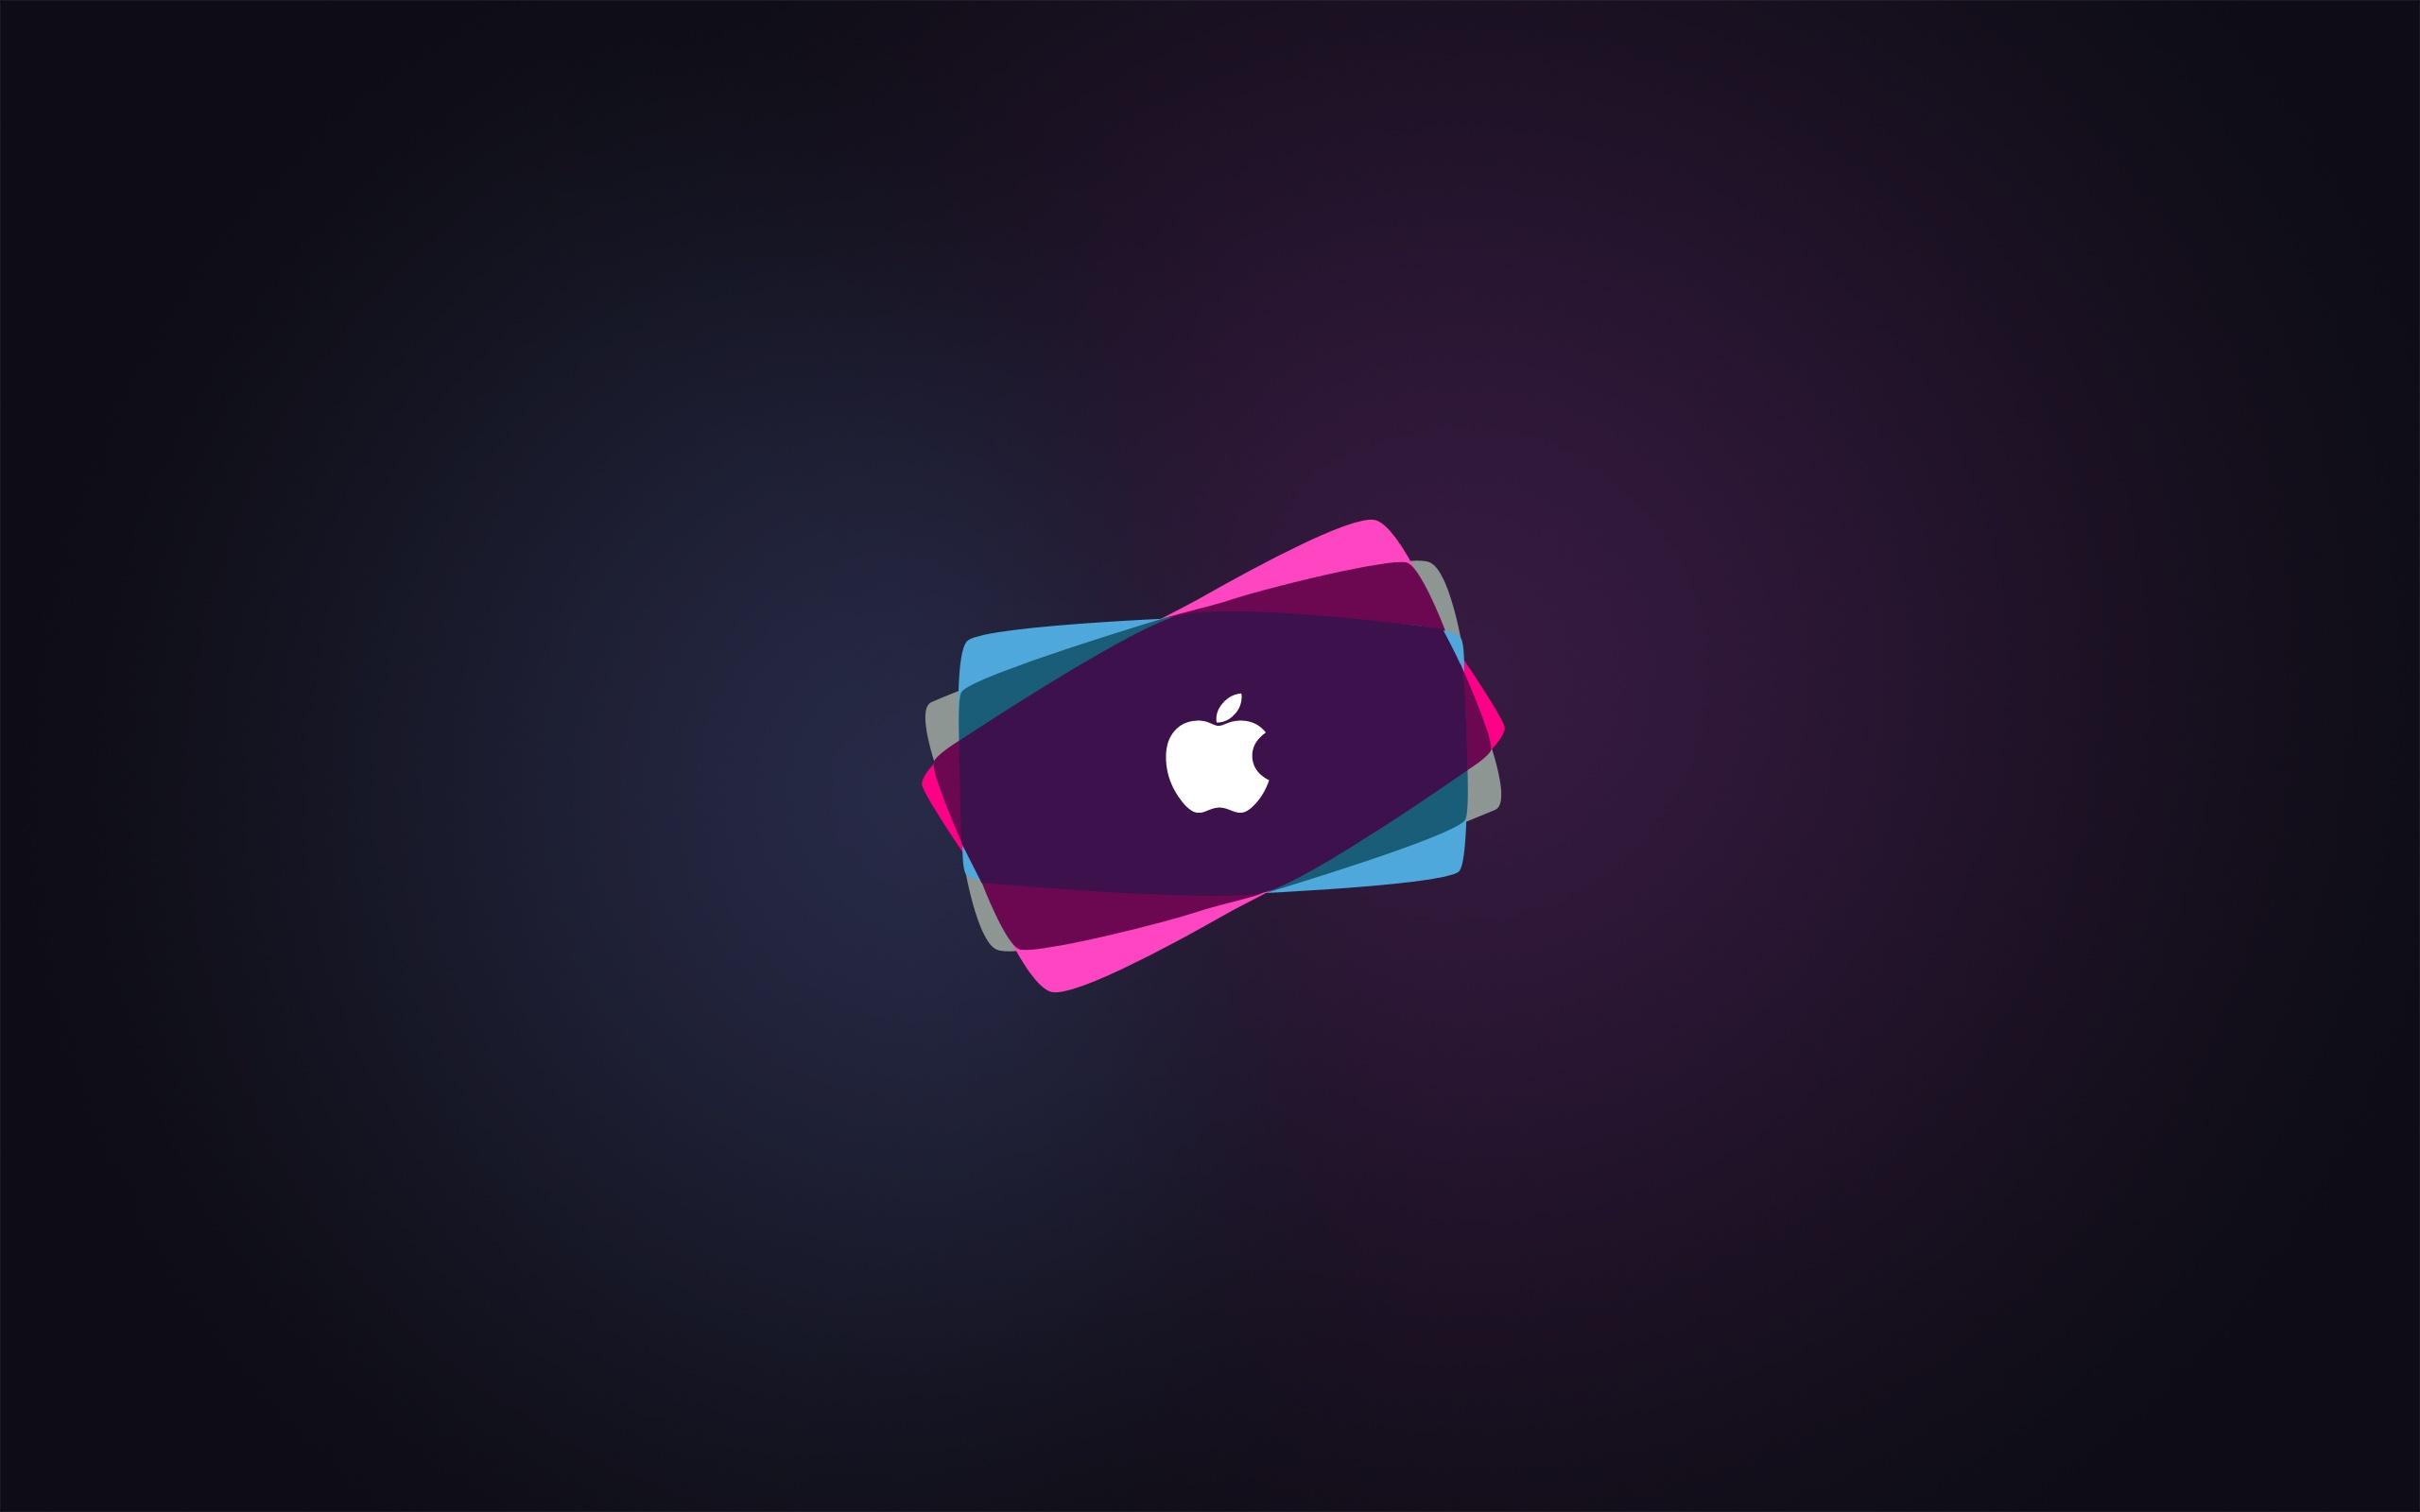 Cool Apple Logos   wallpaper 2560x1600